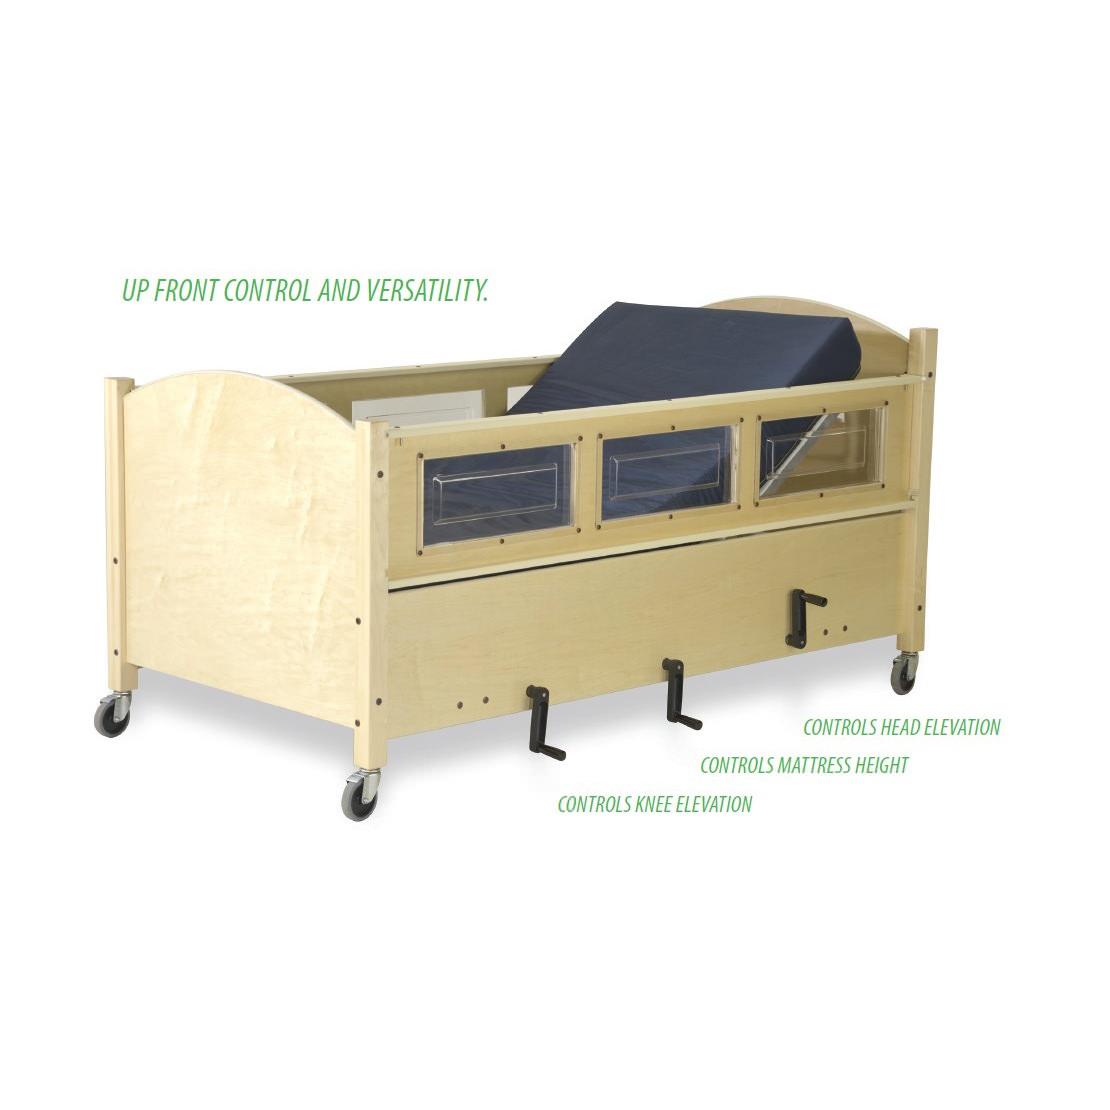 SleepSafer manual tall bed